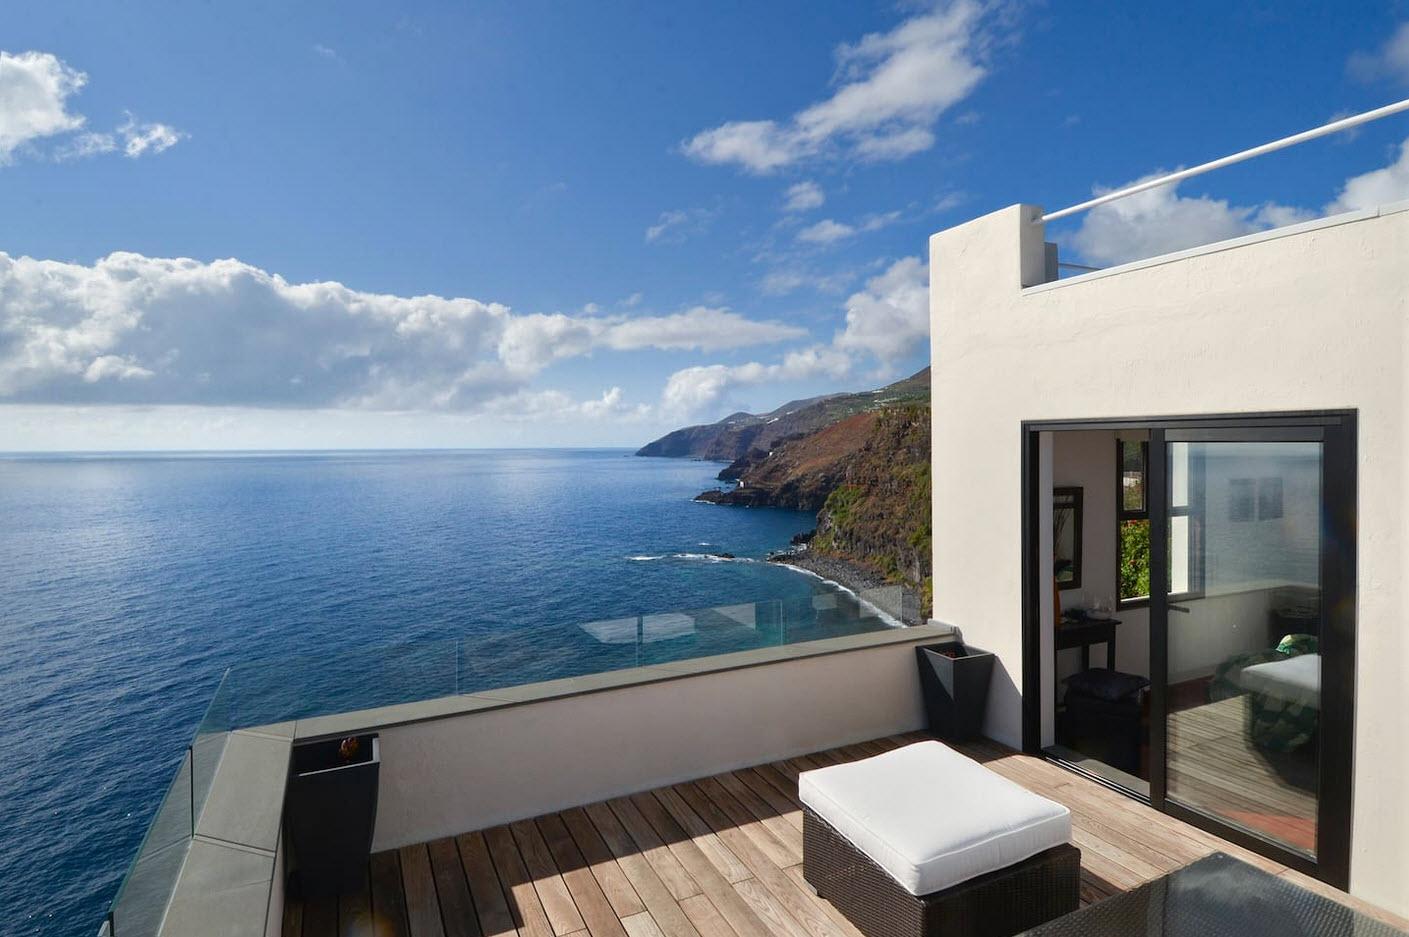 Atlantic Front Tenerife avec terrasse magnifique